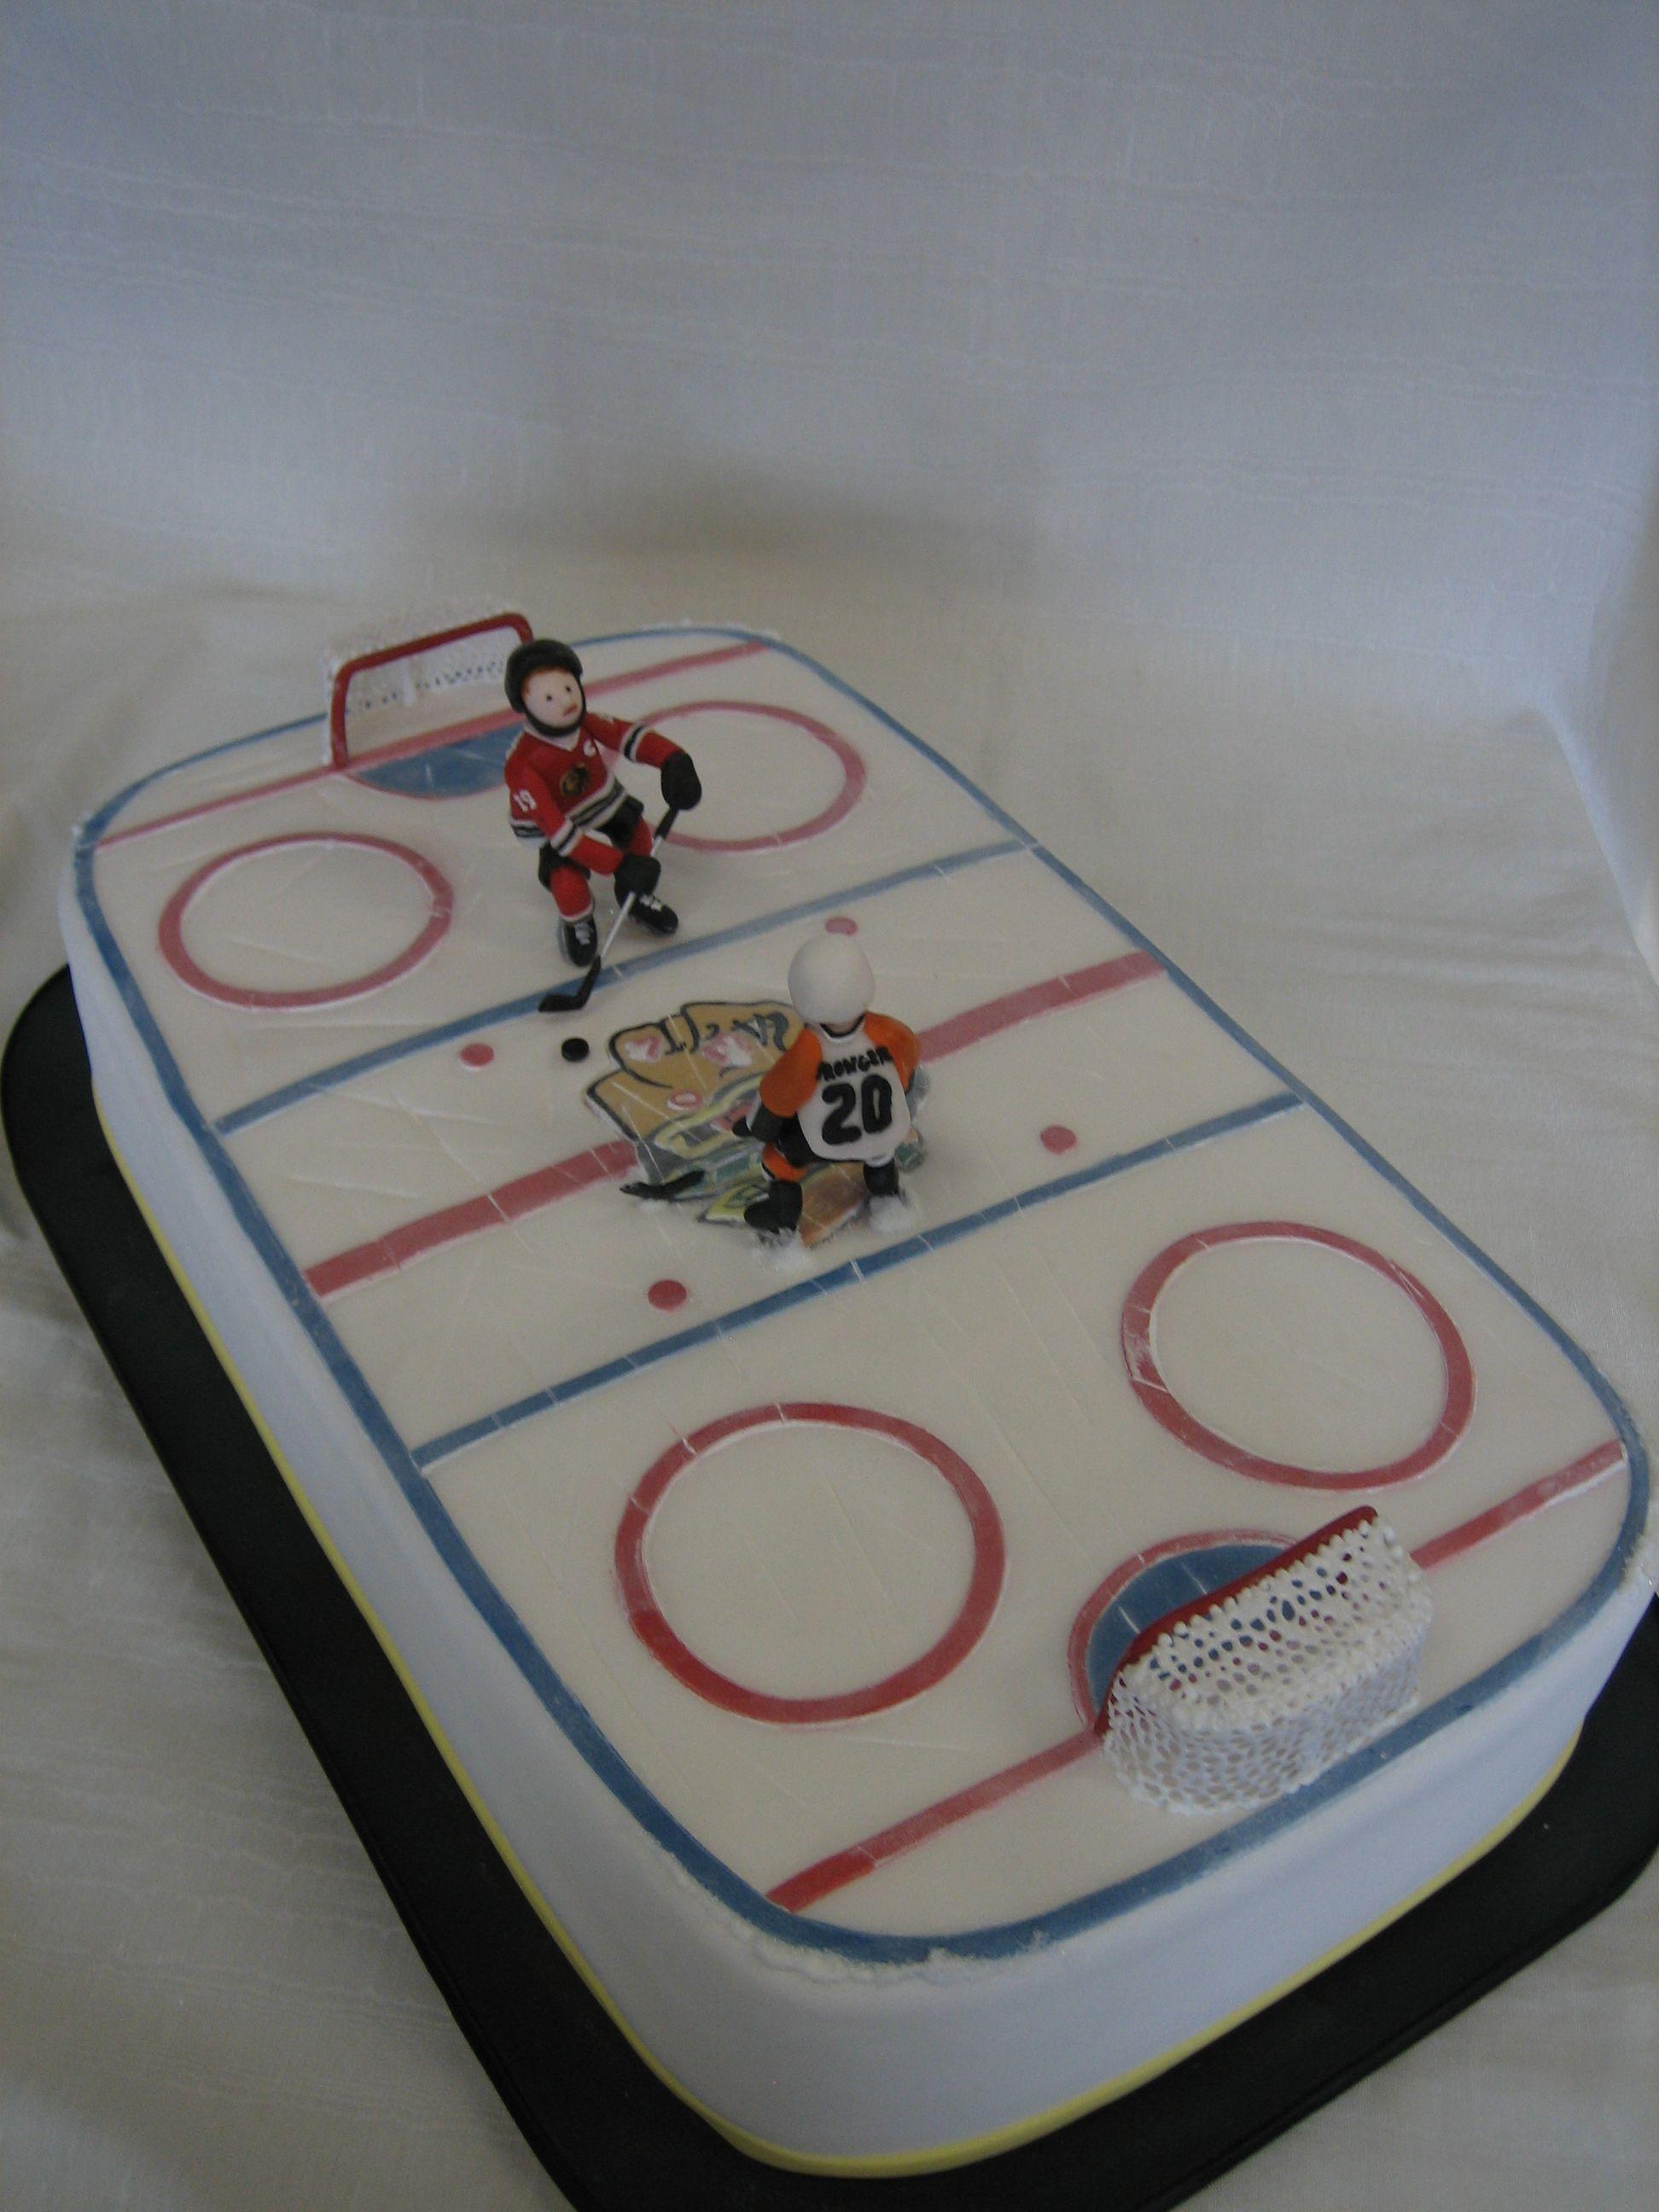 Home Amy Beck Cake Design Amy Beck Cake Design Hockey Birthday Cake Cake Design